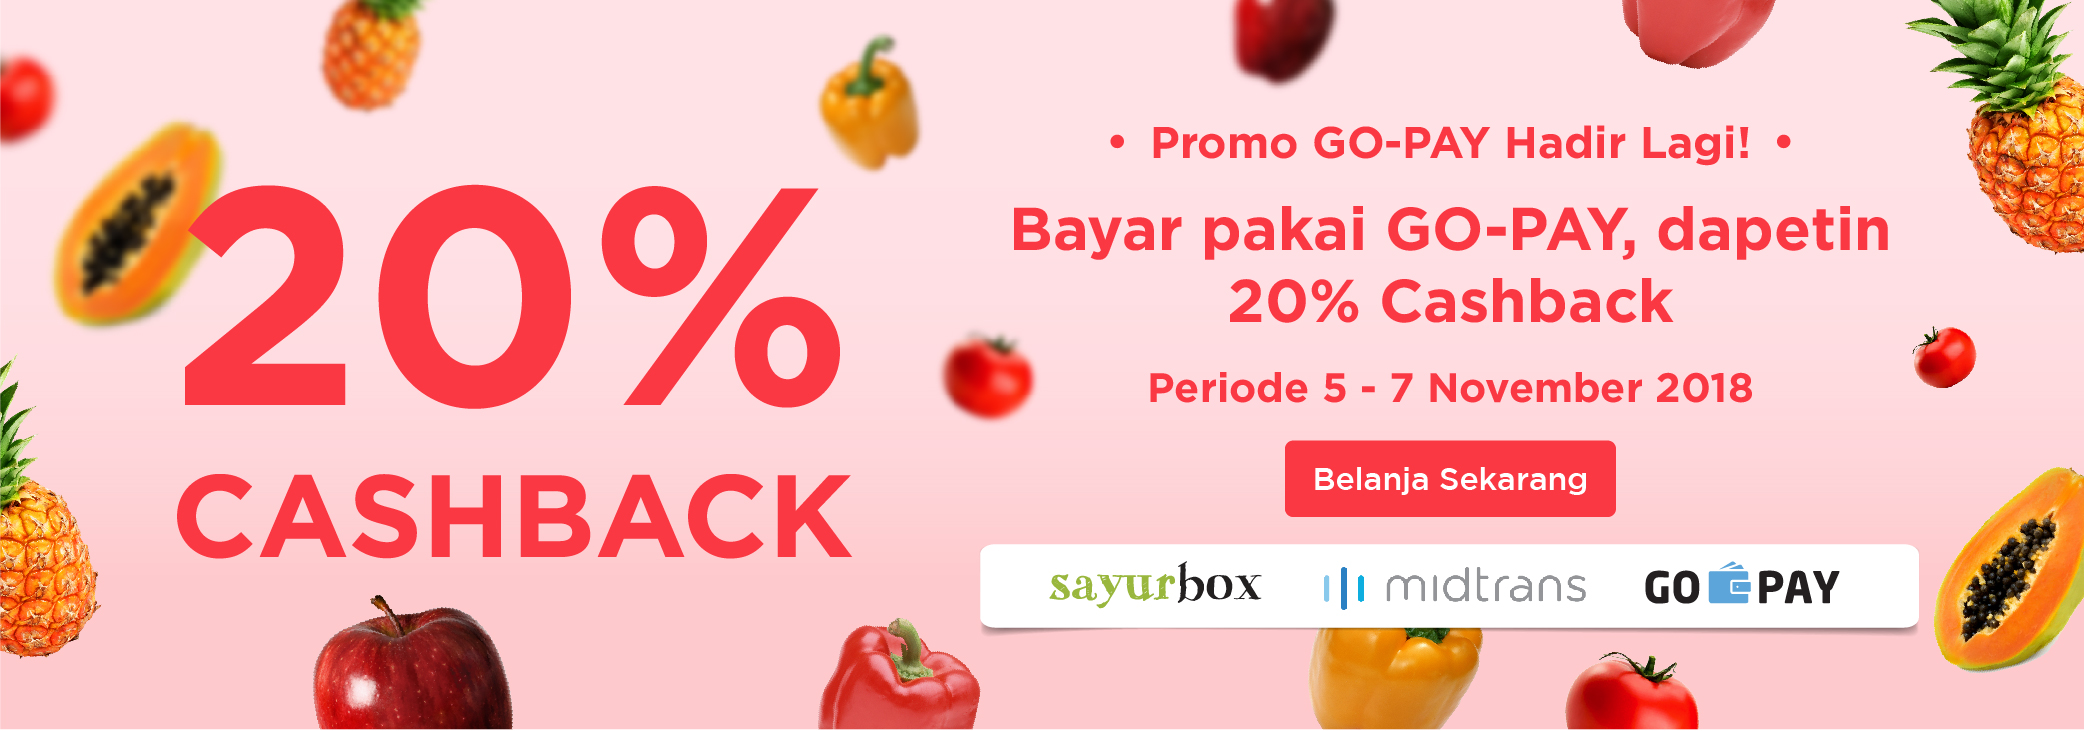 Promo Sayurbox November 2018: Cashback 20%